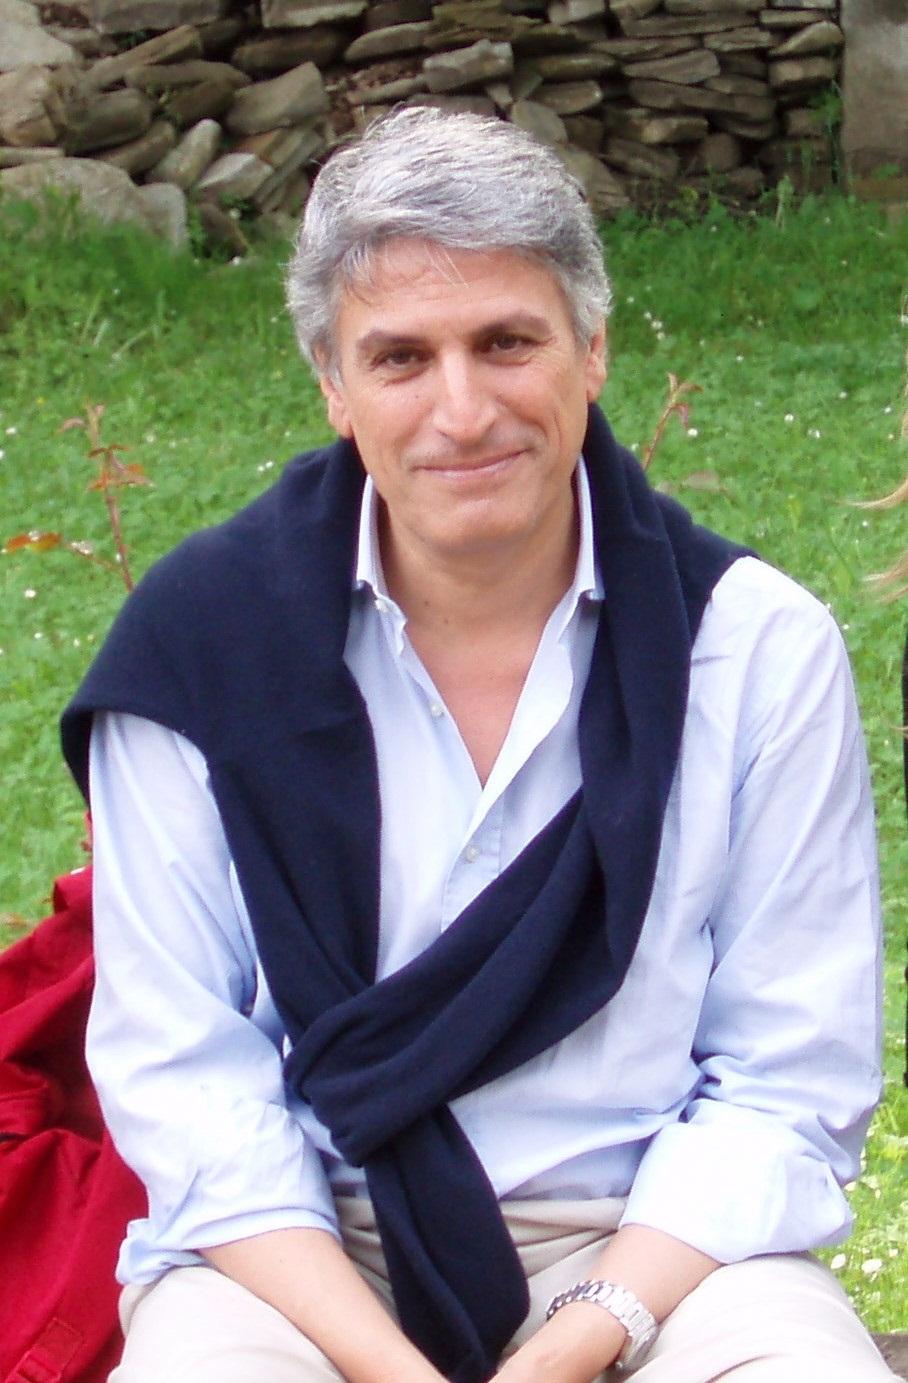 Antonio d'Angiò